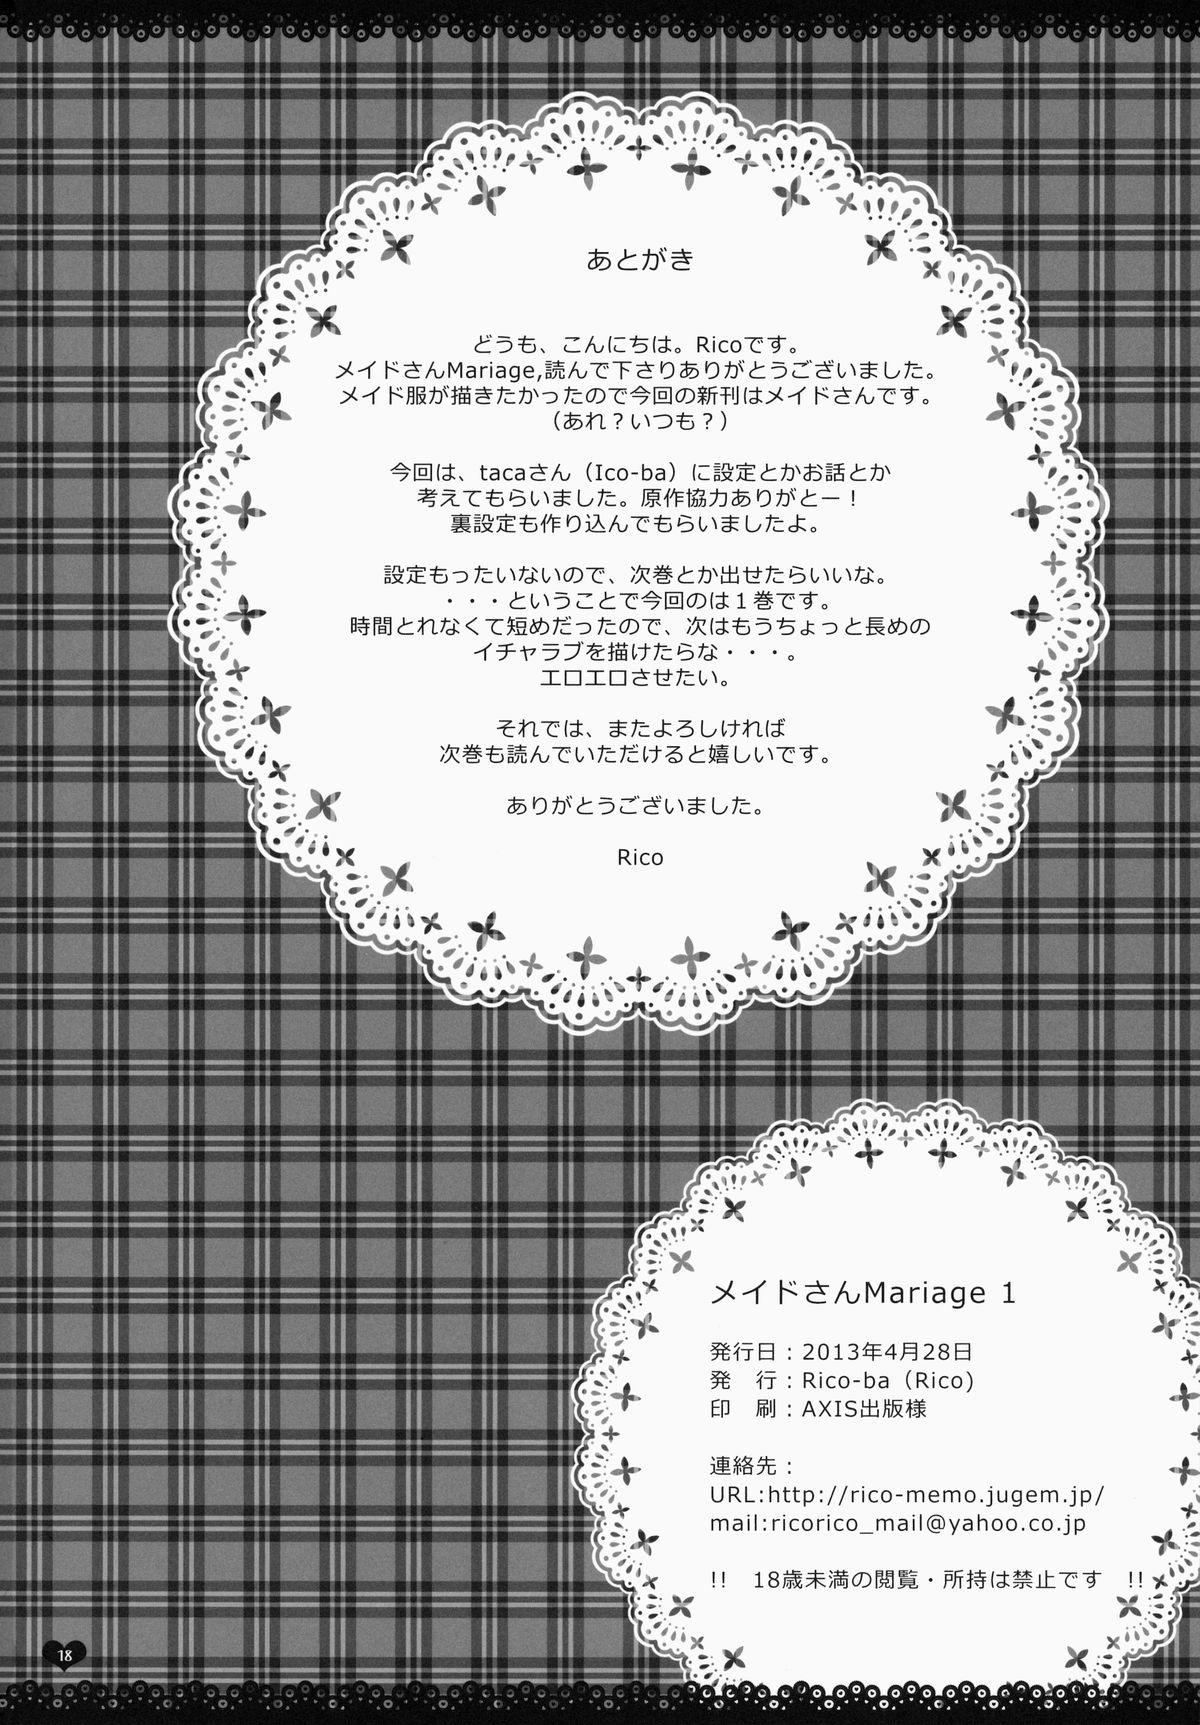 maid-san Mariage 1 17